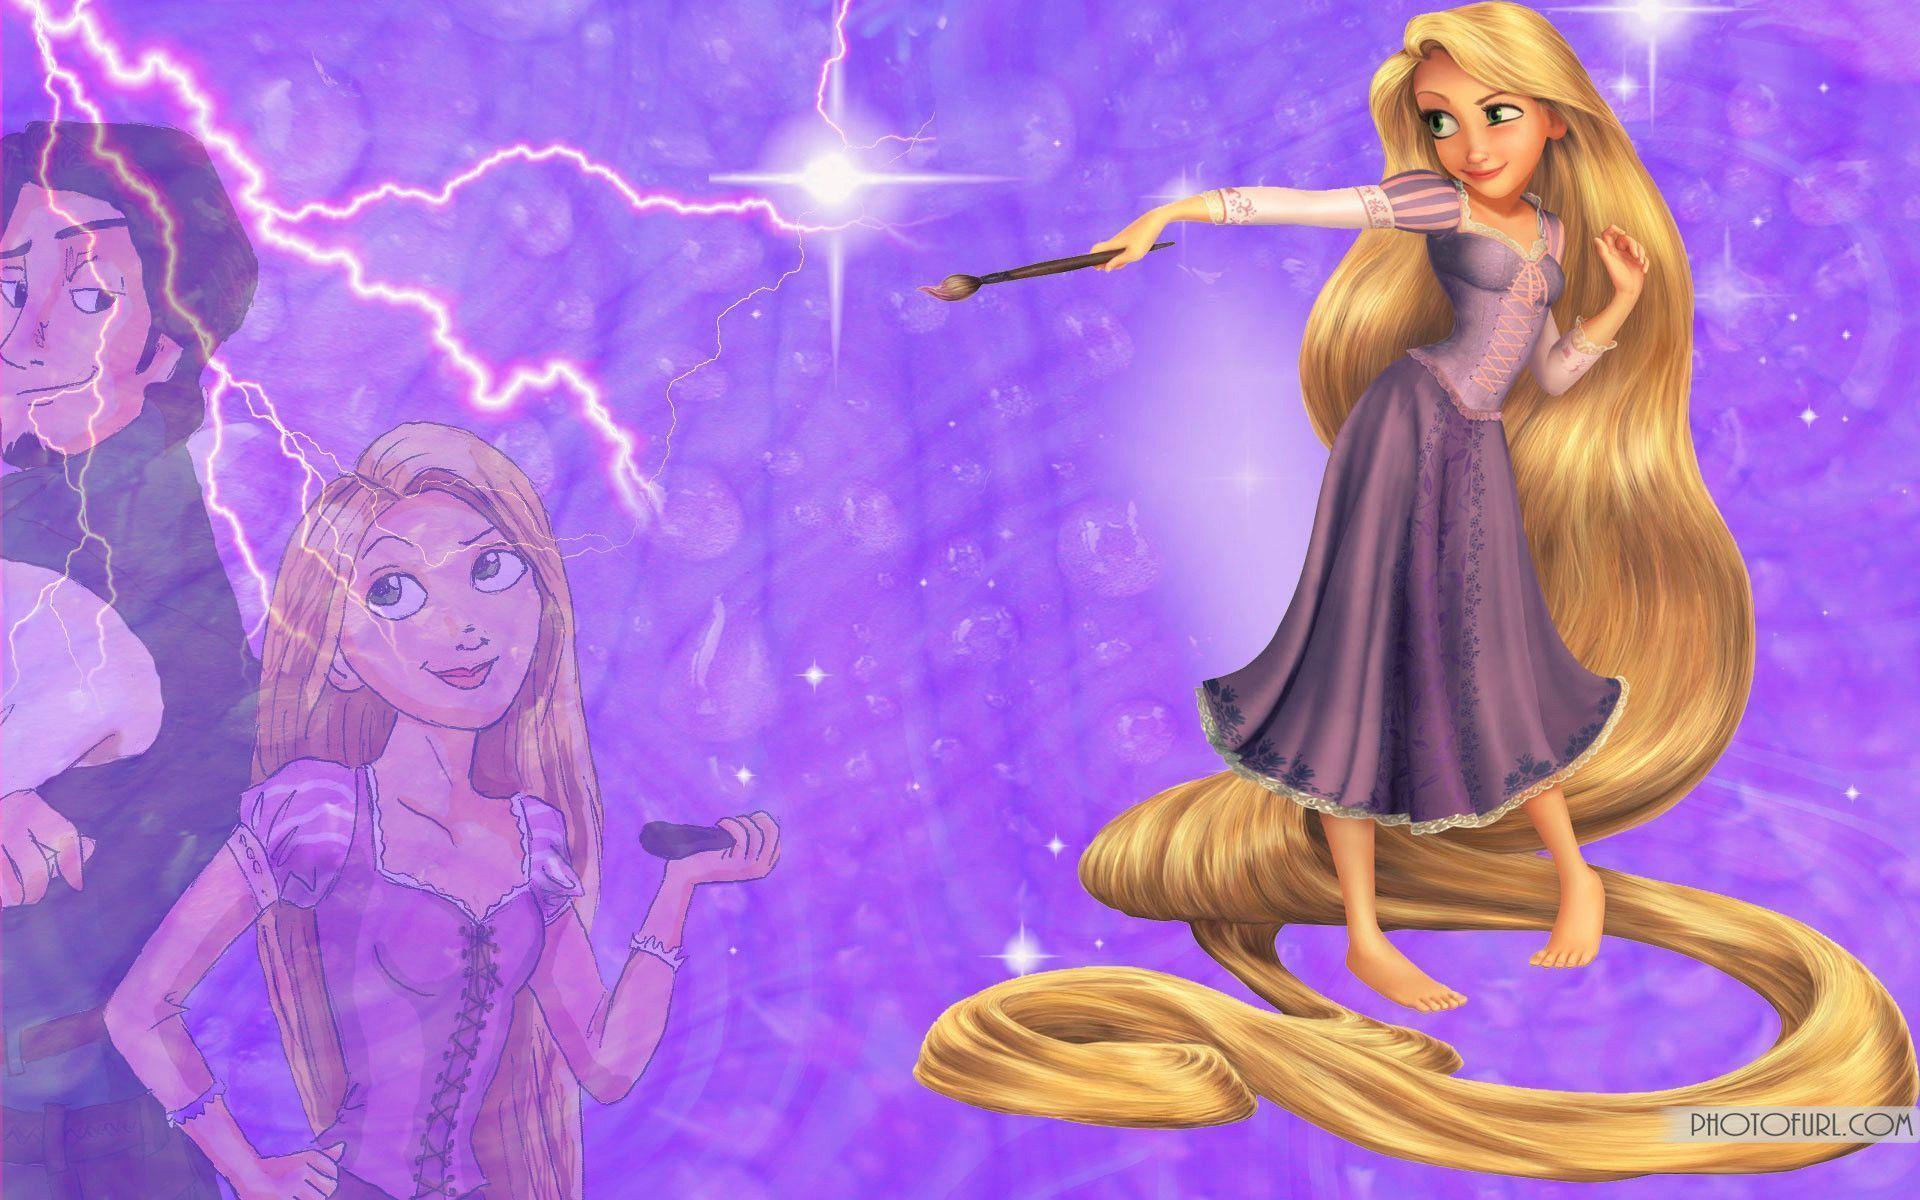 Rapunzel Wallpapers Wallpaper Cave HD Wallpapers Download Free Images Wallpaper [1000image.com]